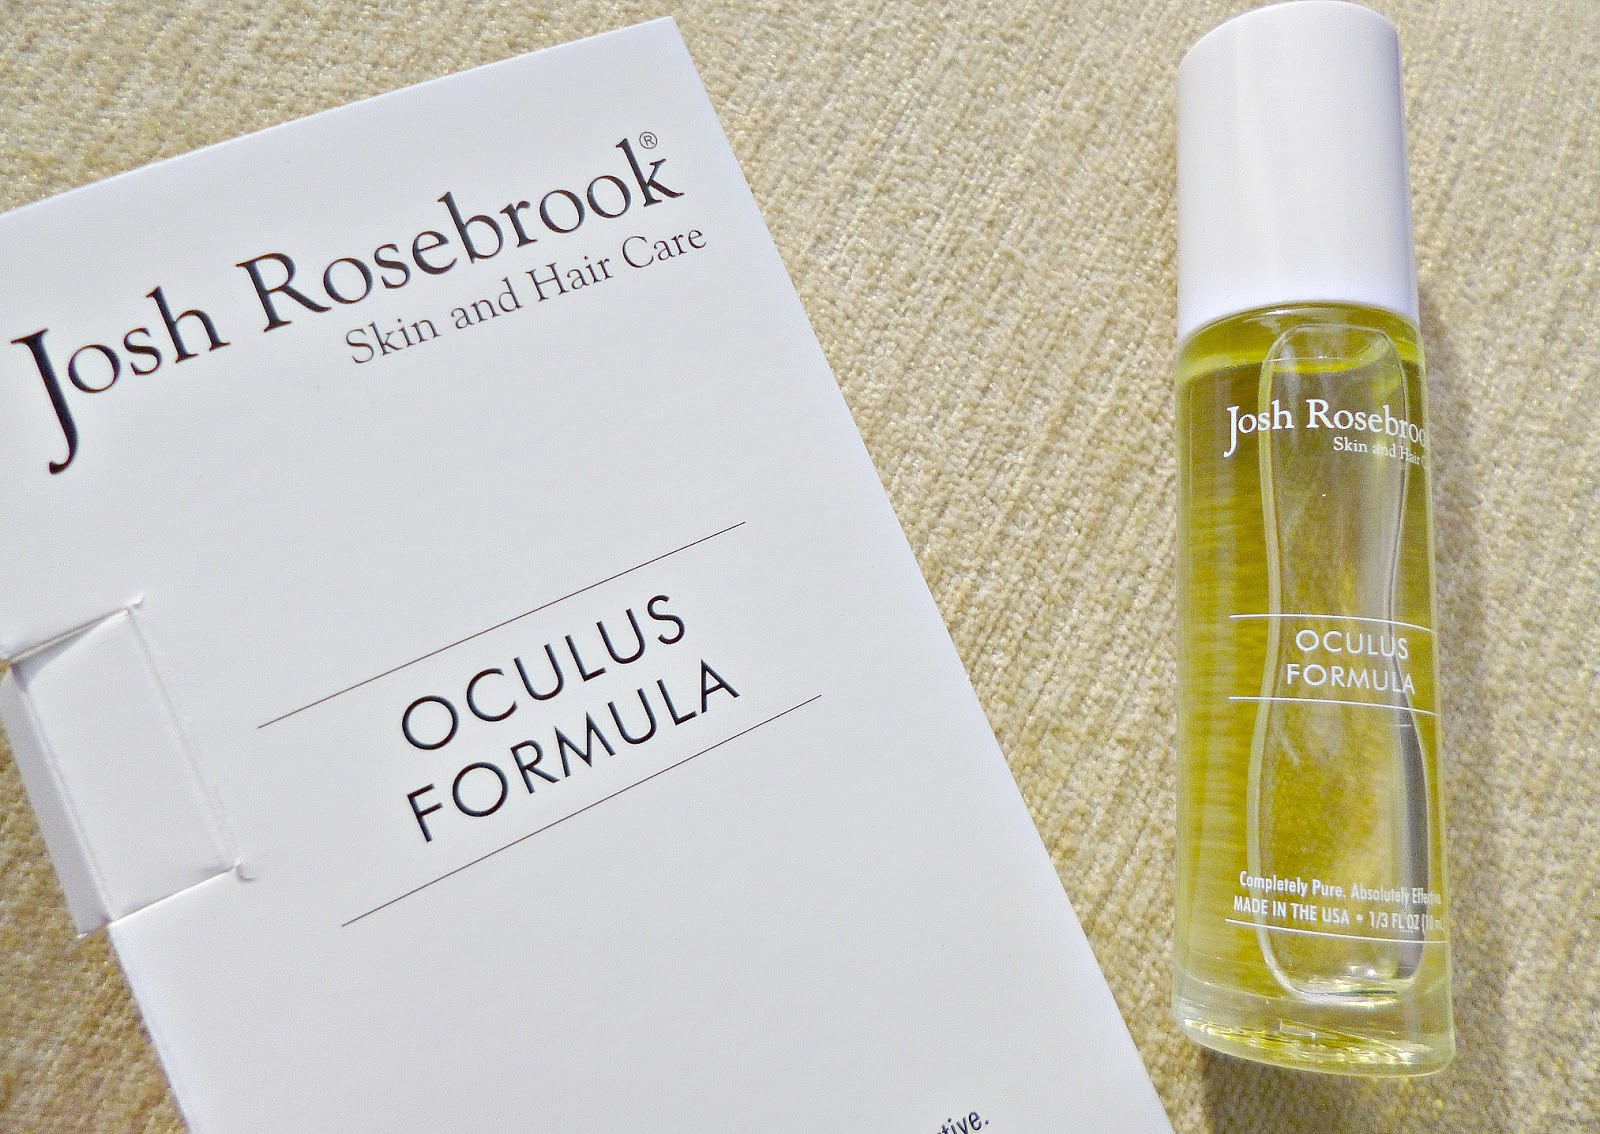 New in: Josh Rosebrook Oculus formula